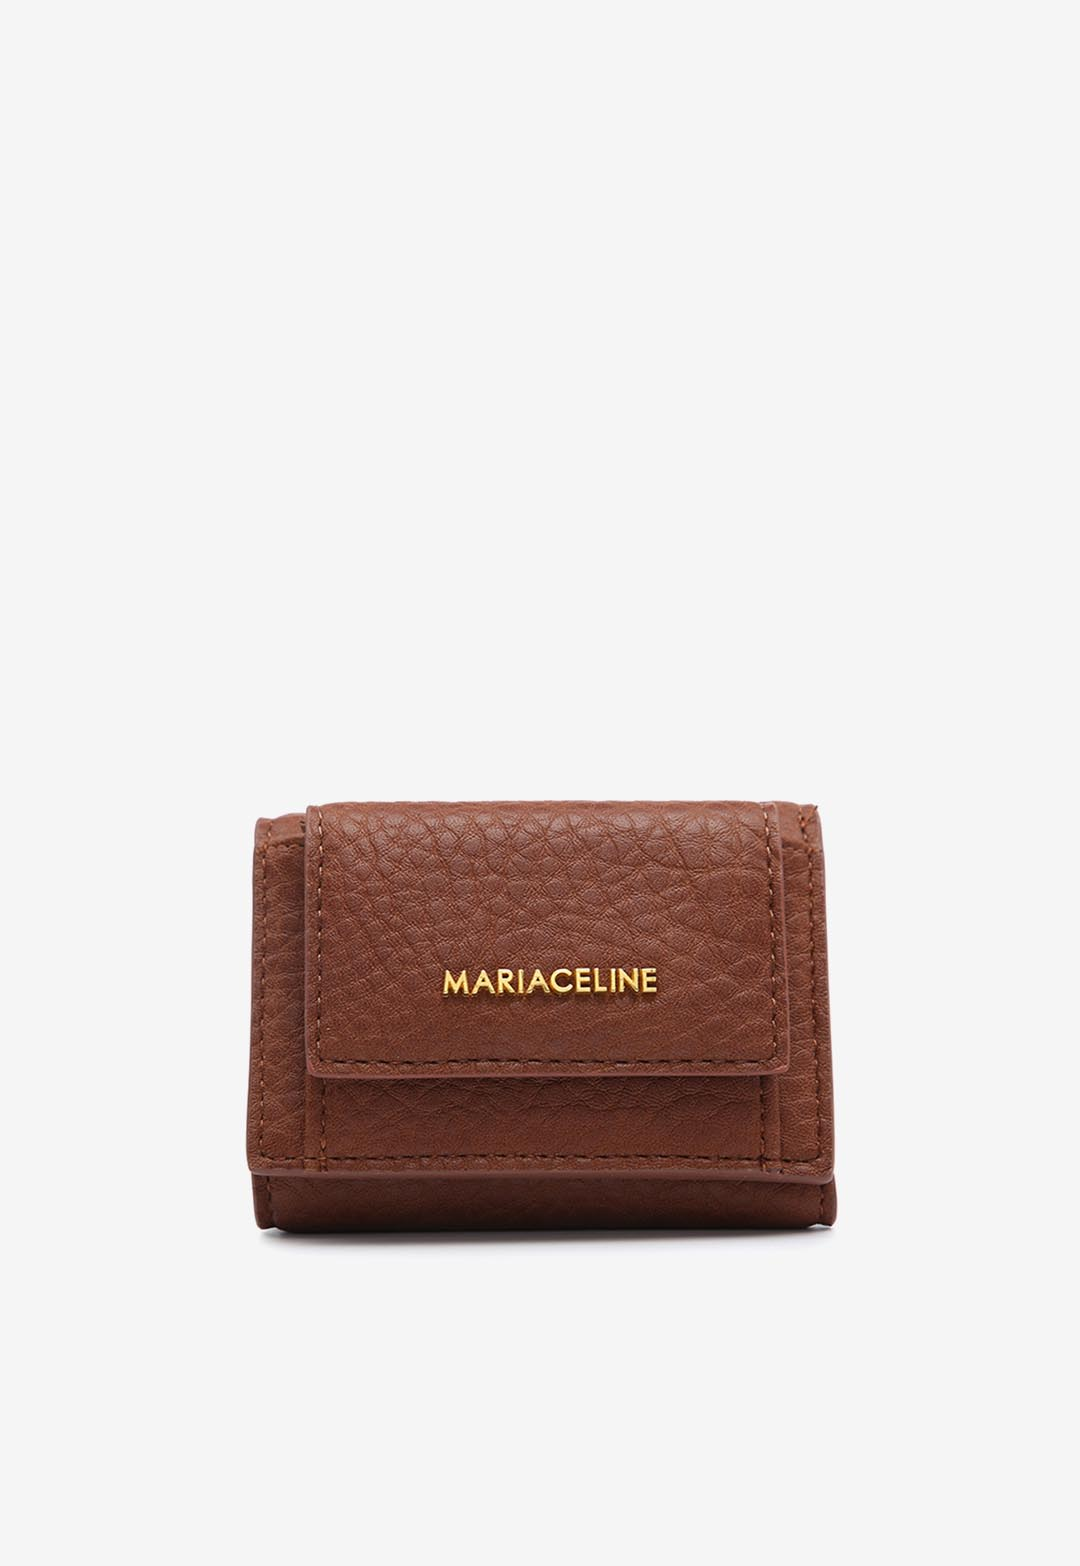 MariaCeline